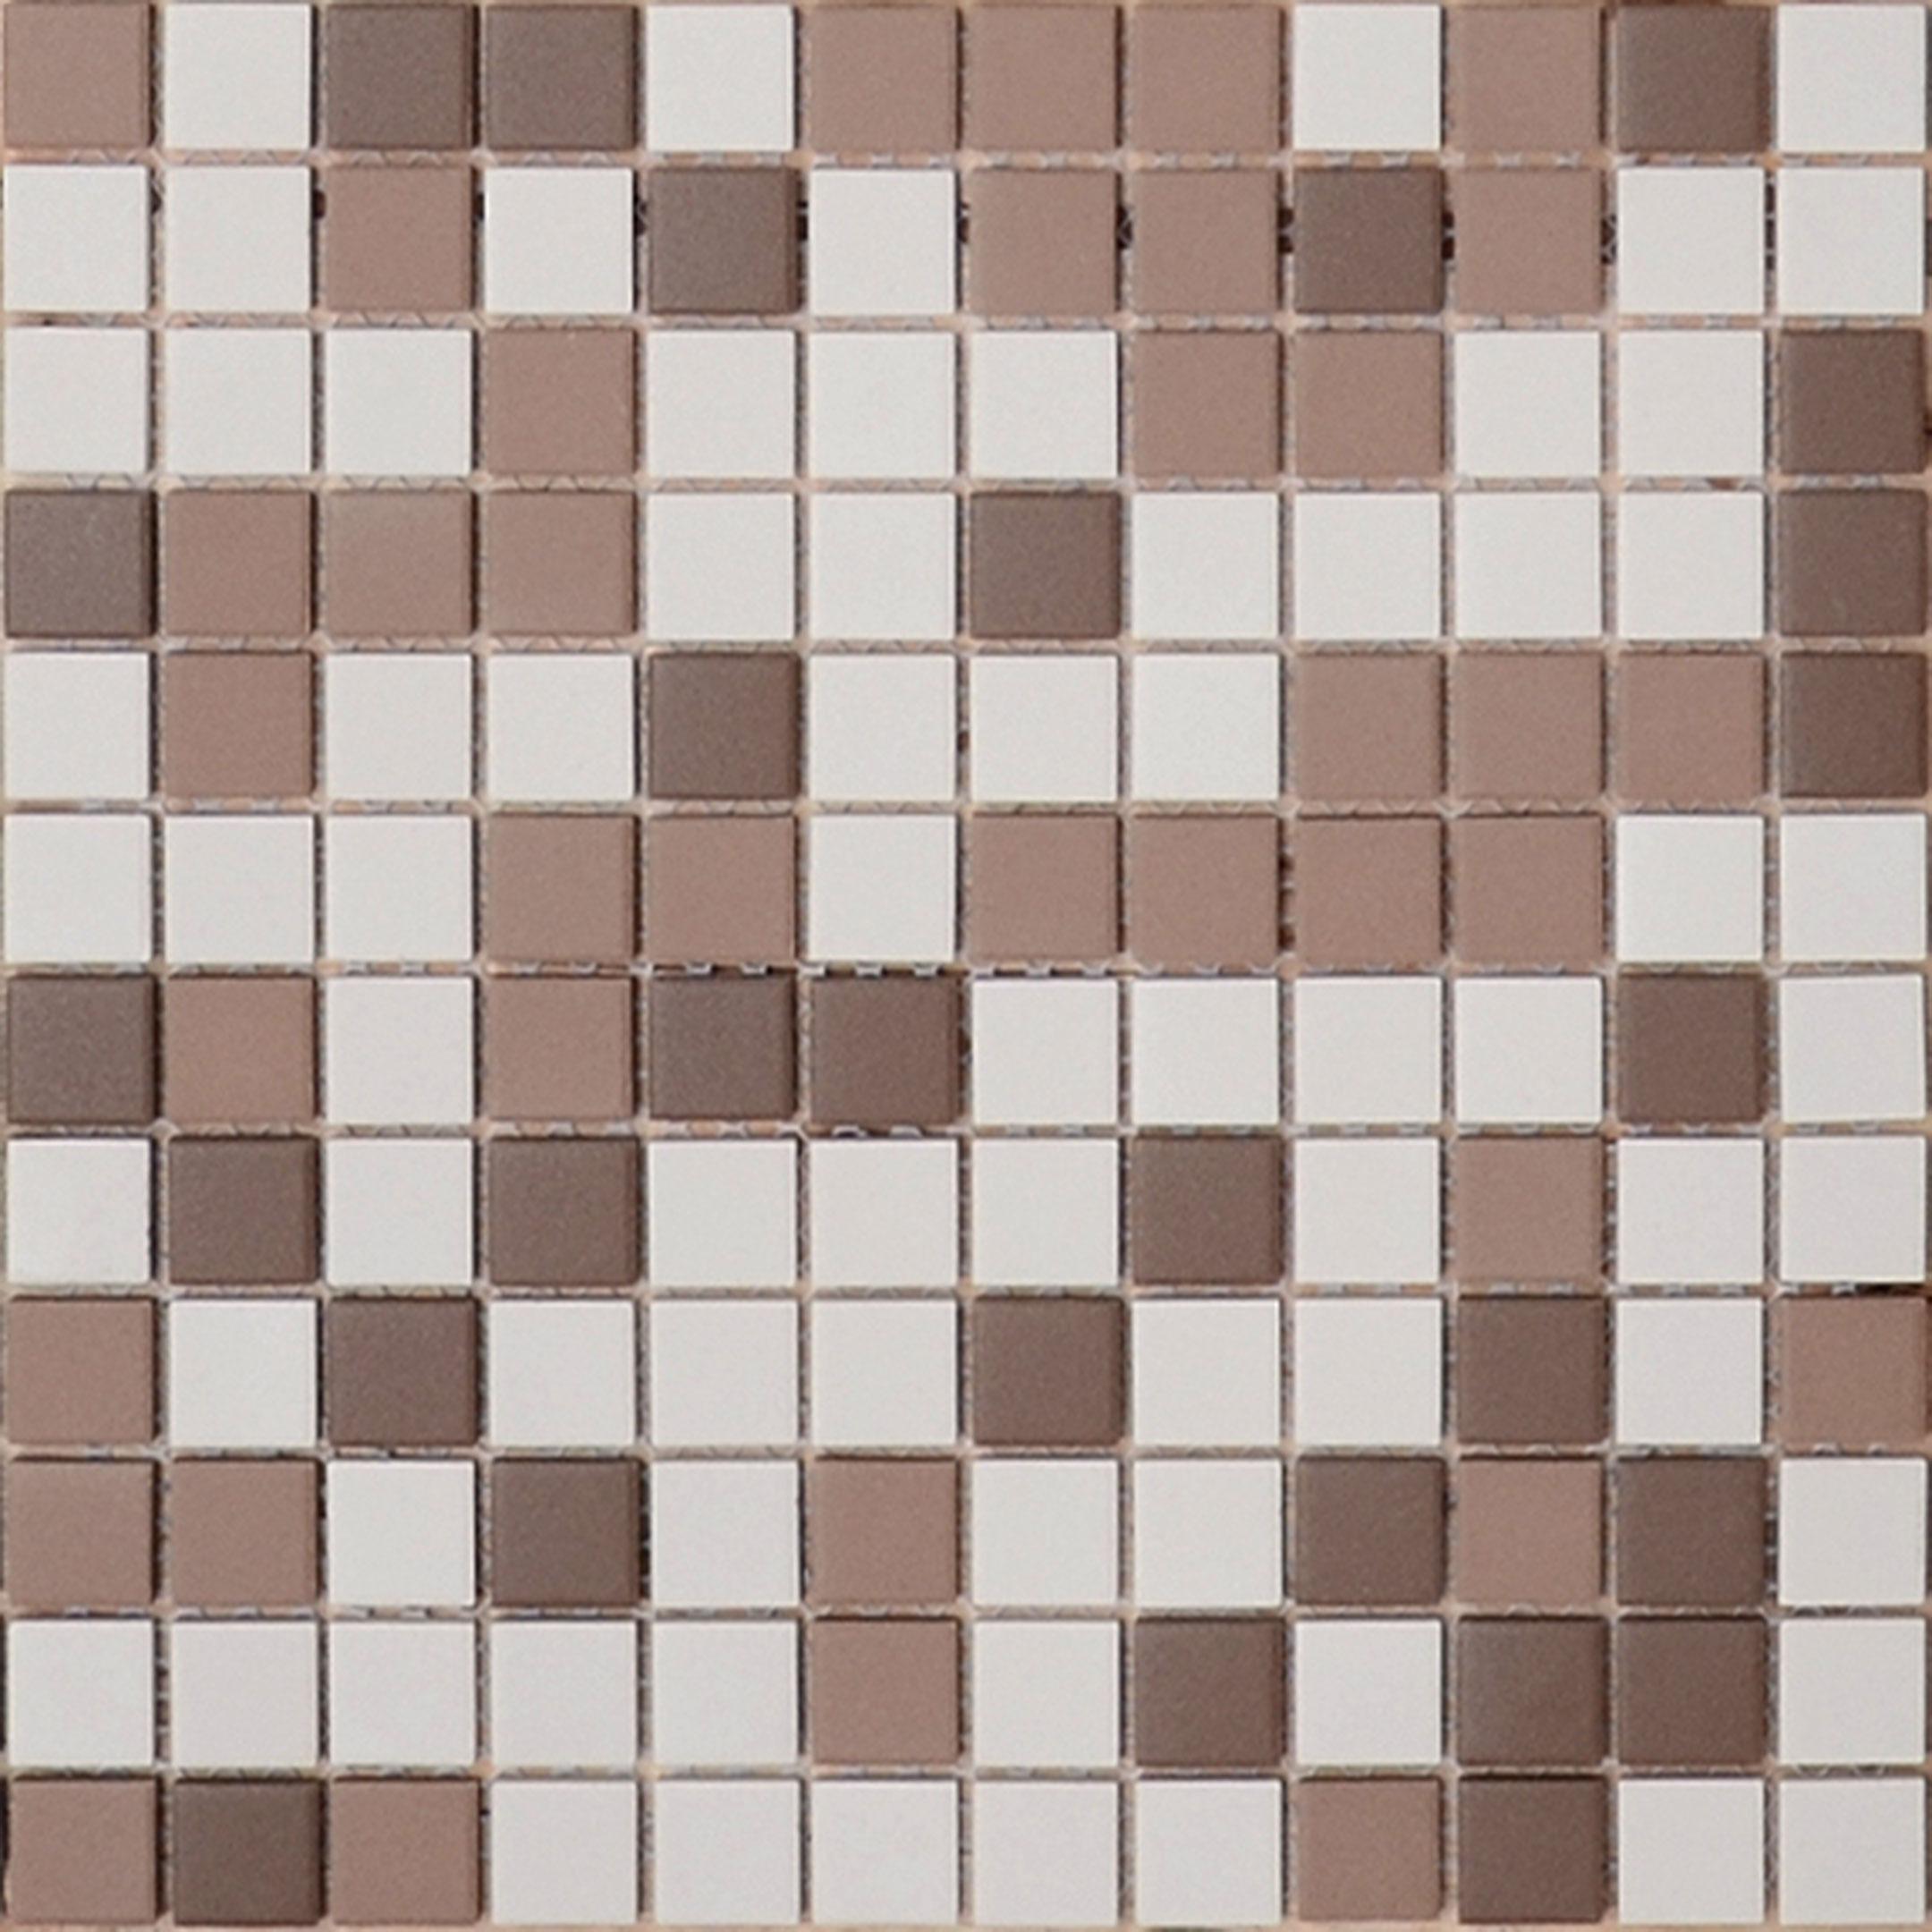 Мозаика Caramelle Marte микс коричневый из керамогранита 300х300х6 мм